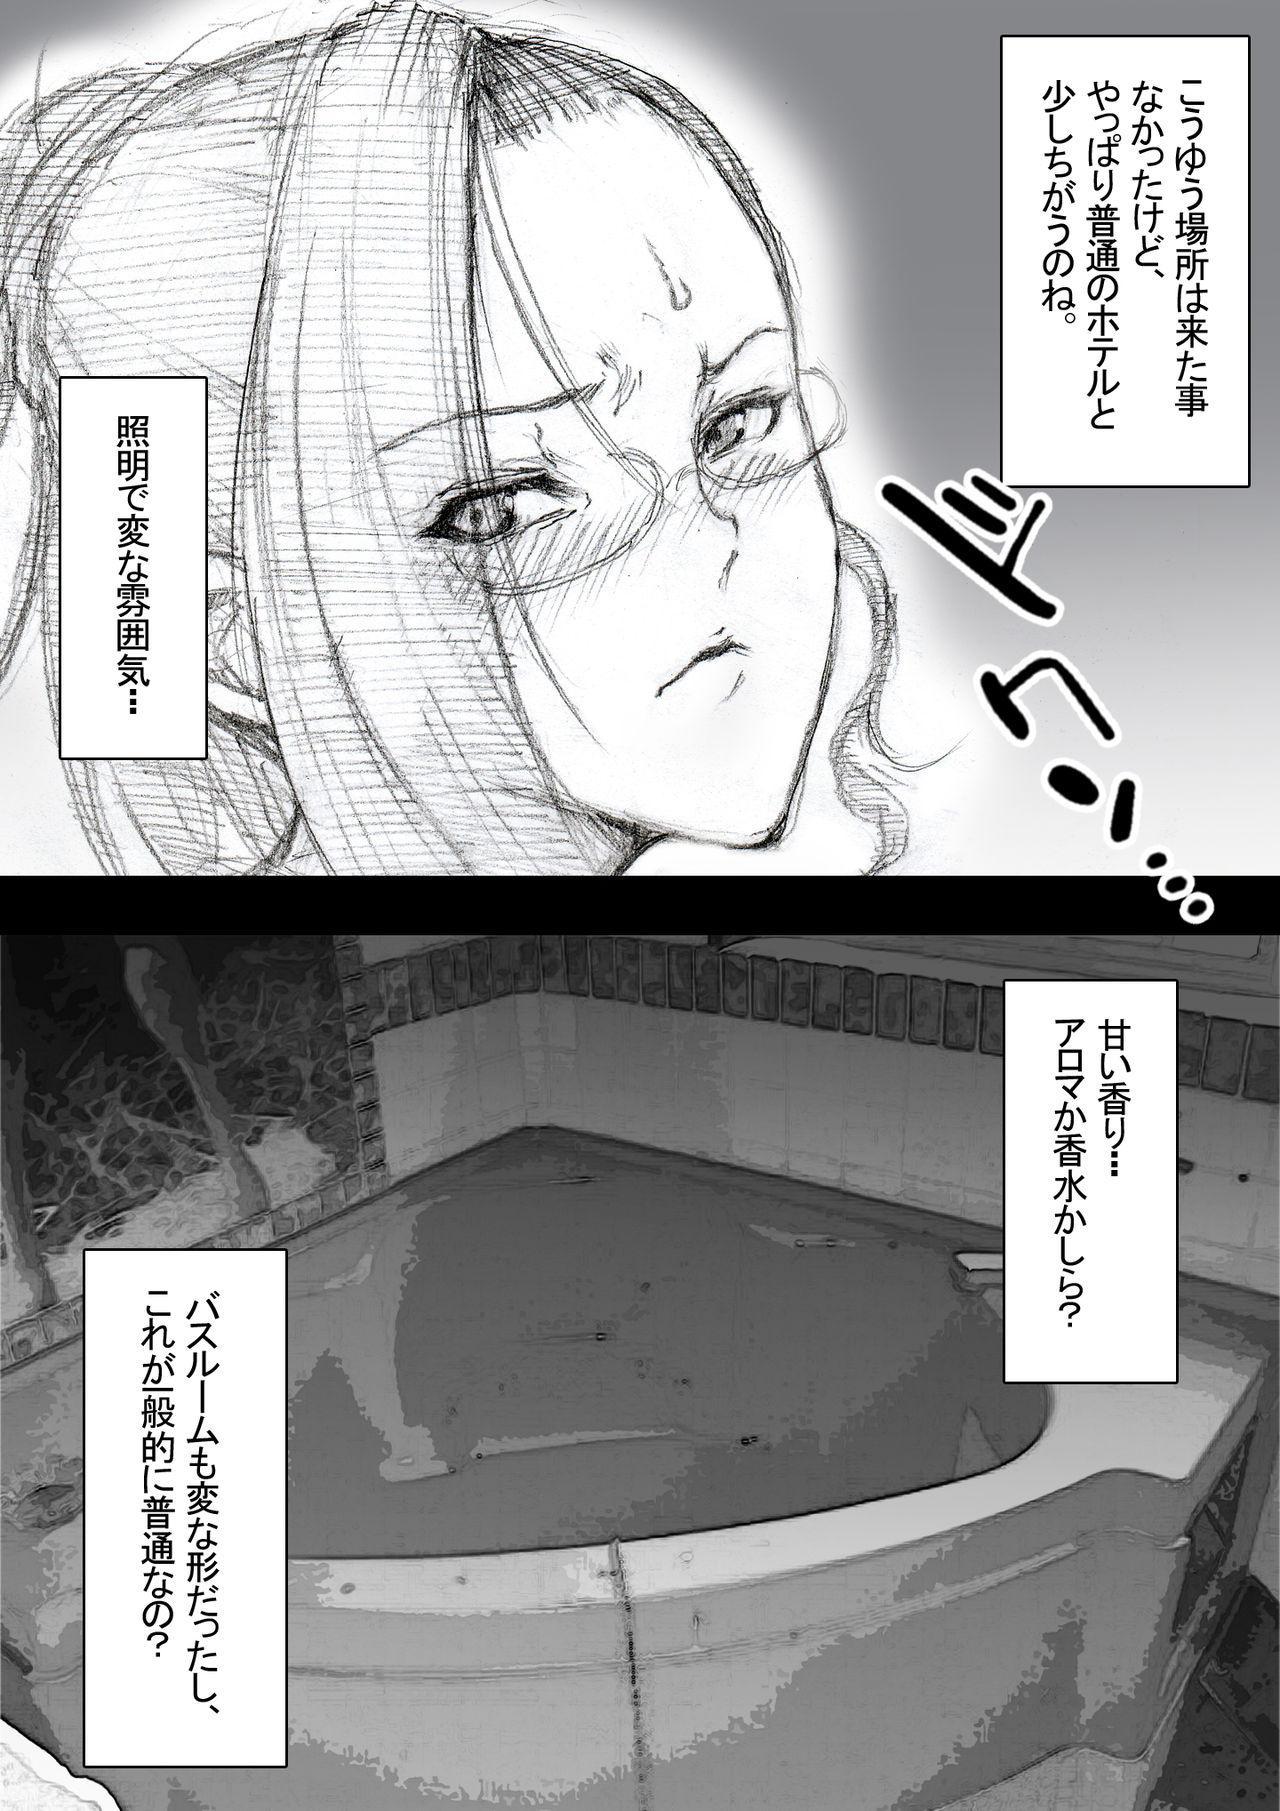 市ノ瀬美加子の場合 25